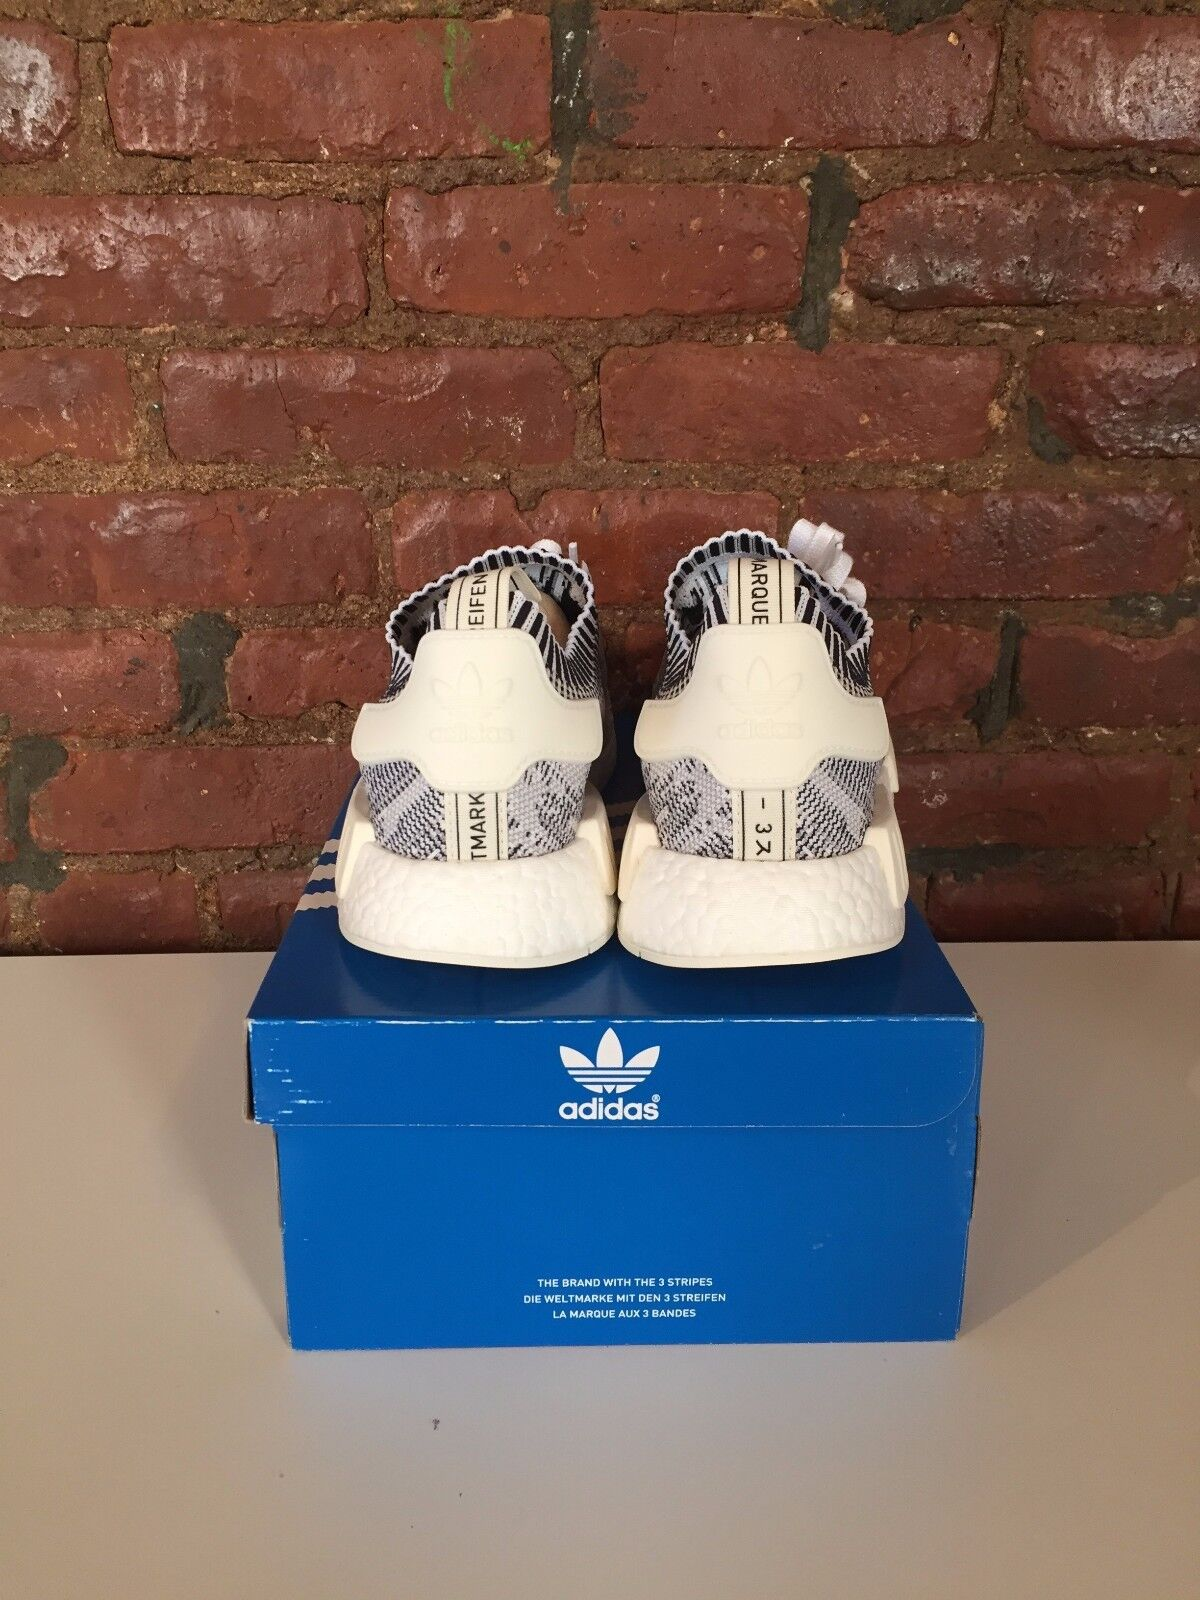 Adidas Nmd R1 Pack